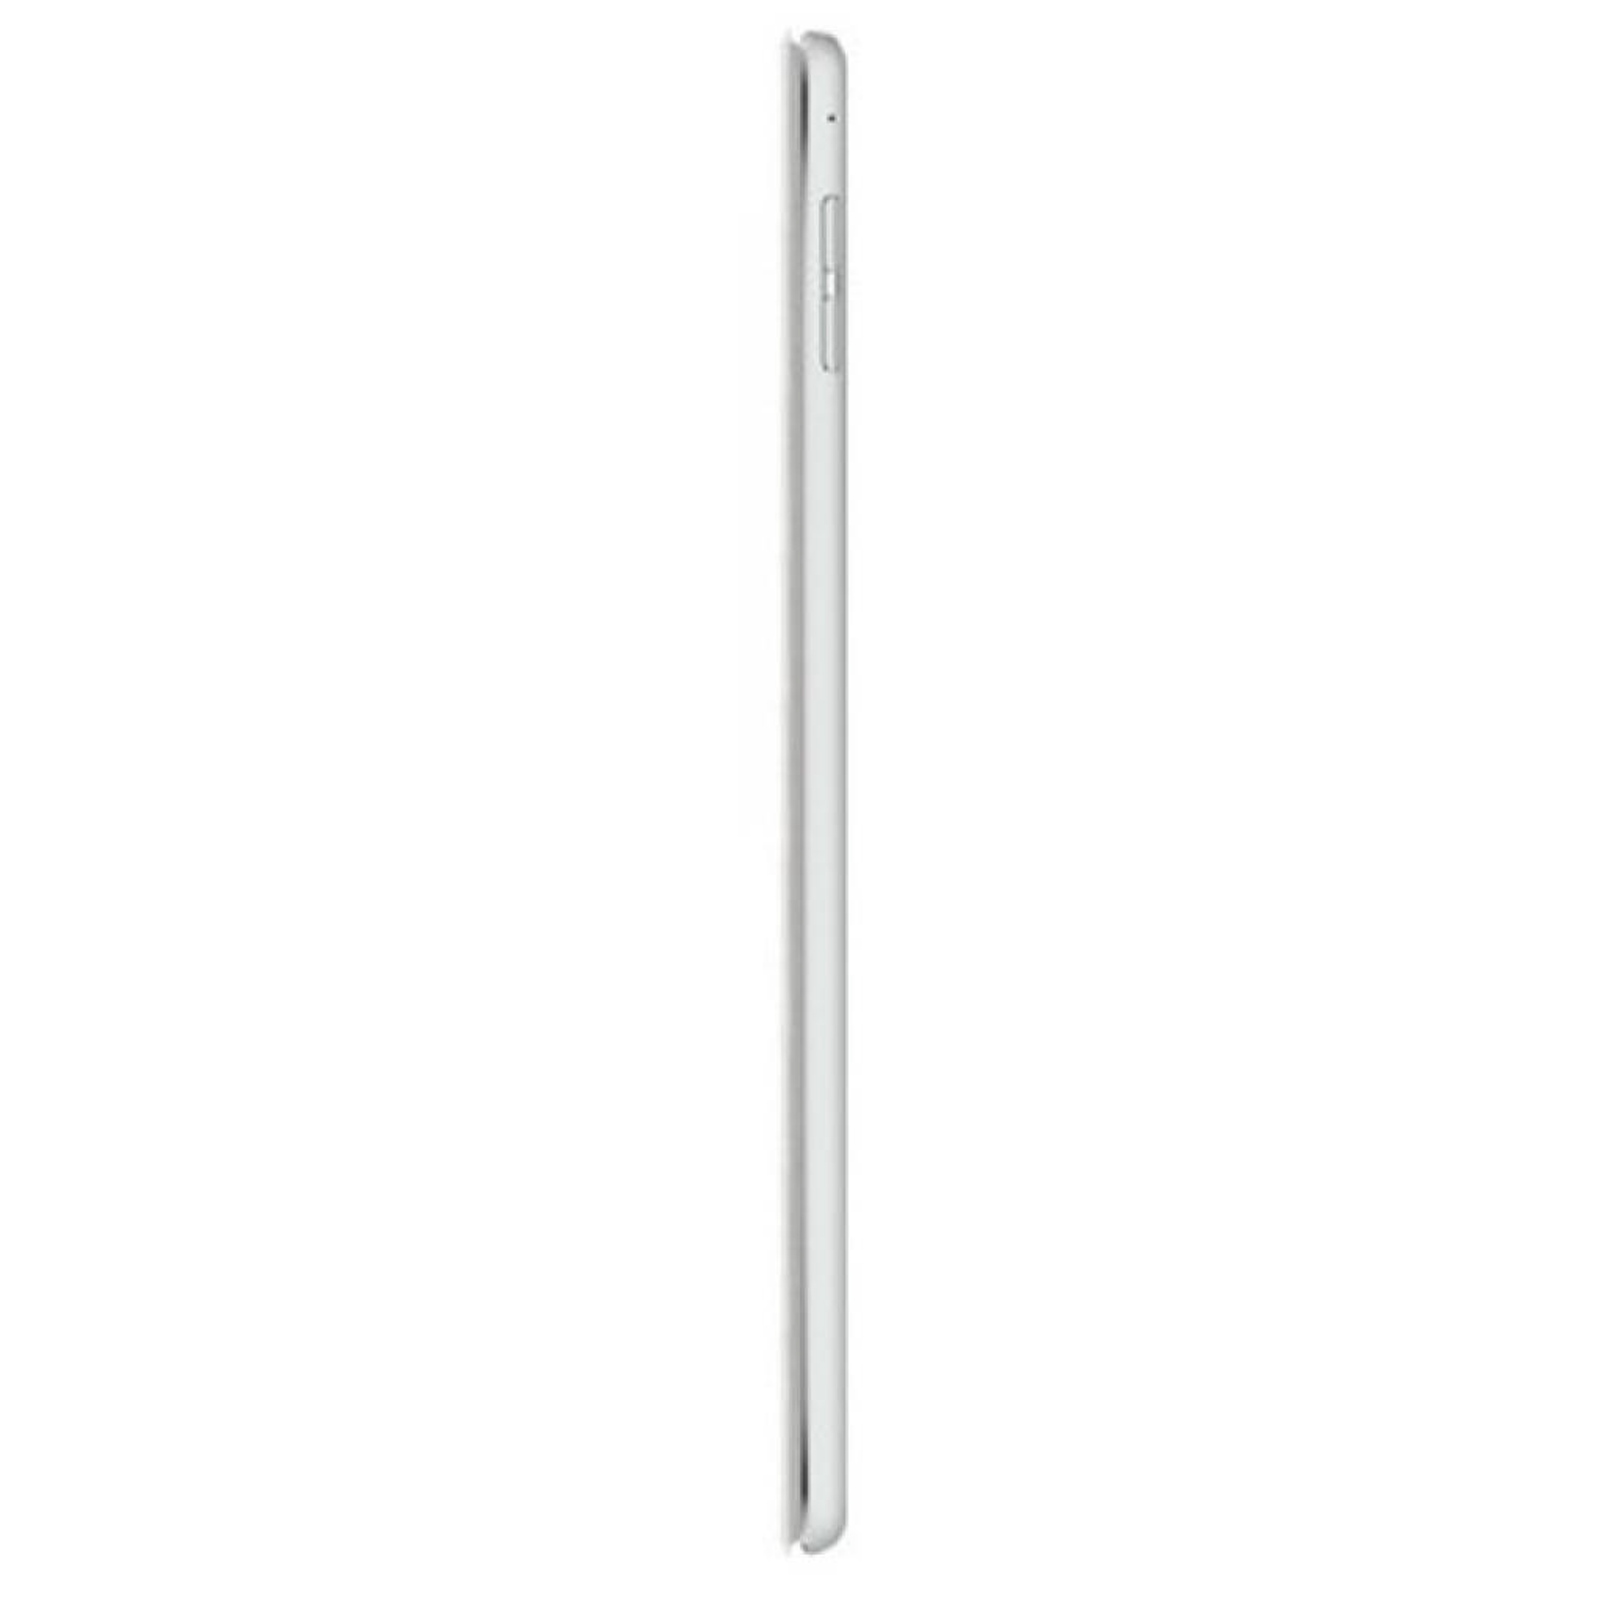 Чехол для планшета Apple Smart Cover для iPad mini 4 White (MKLW2ZM/A) изображение 7